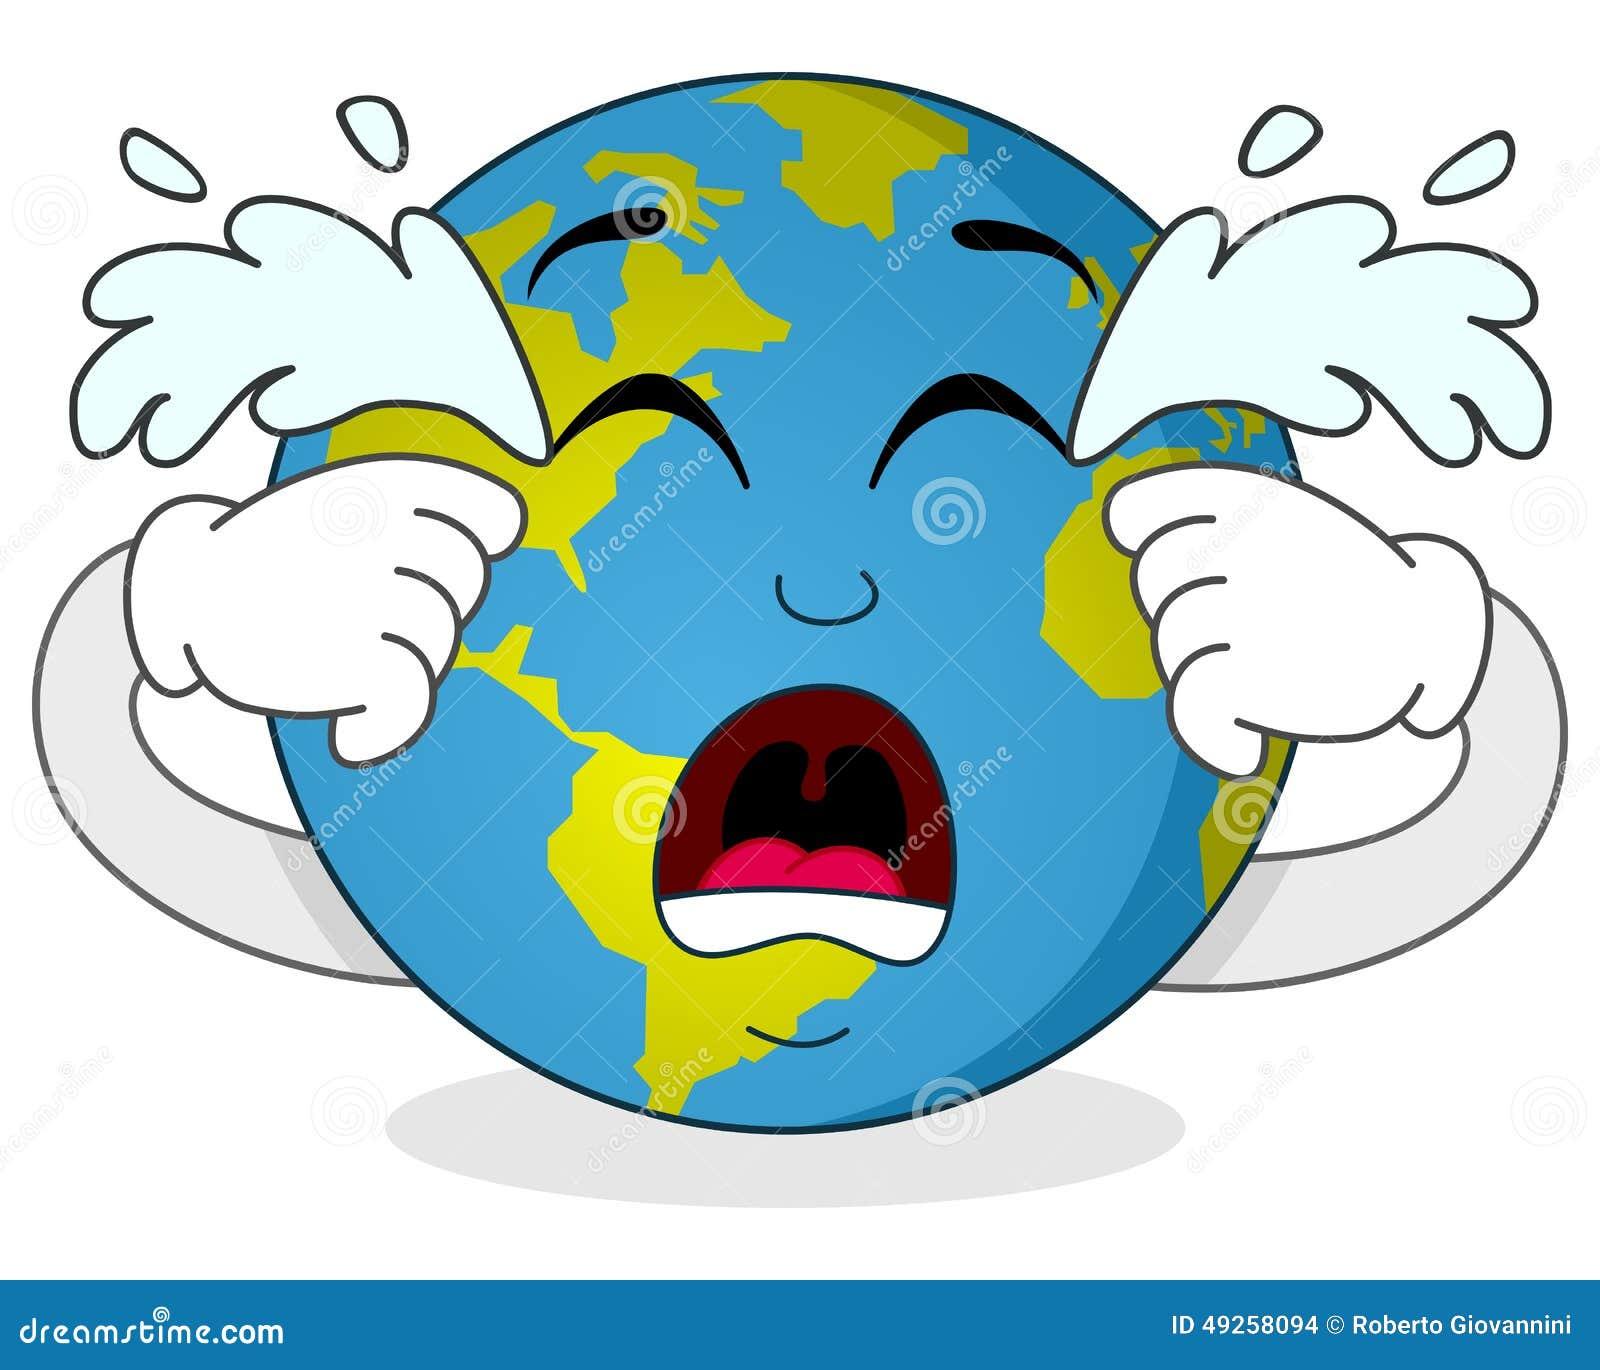 Cartoon Characters Crying : Sad crying earth cartoon character vector illustration